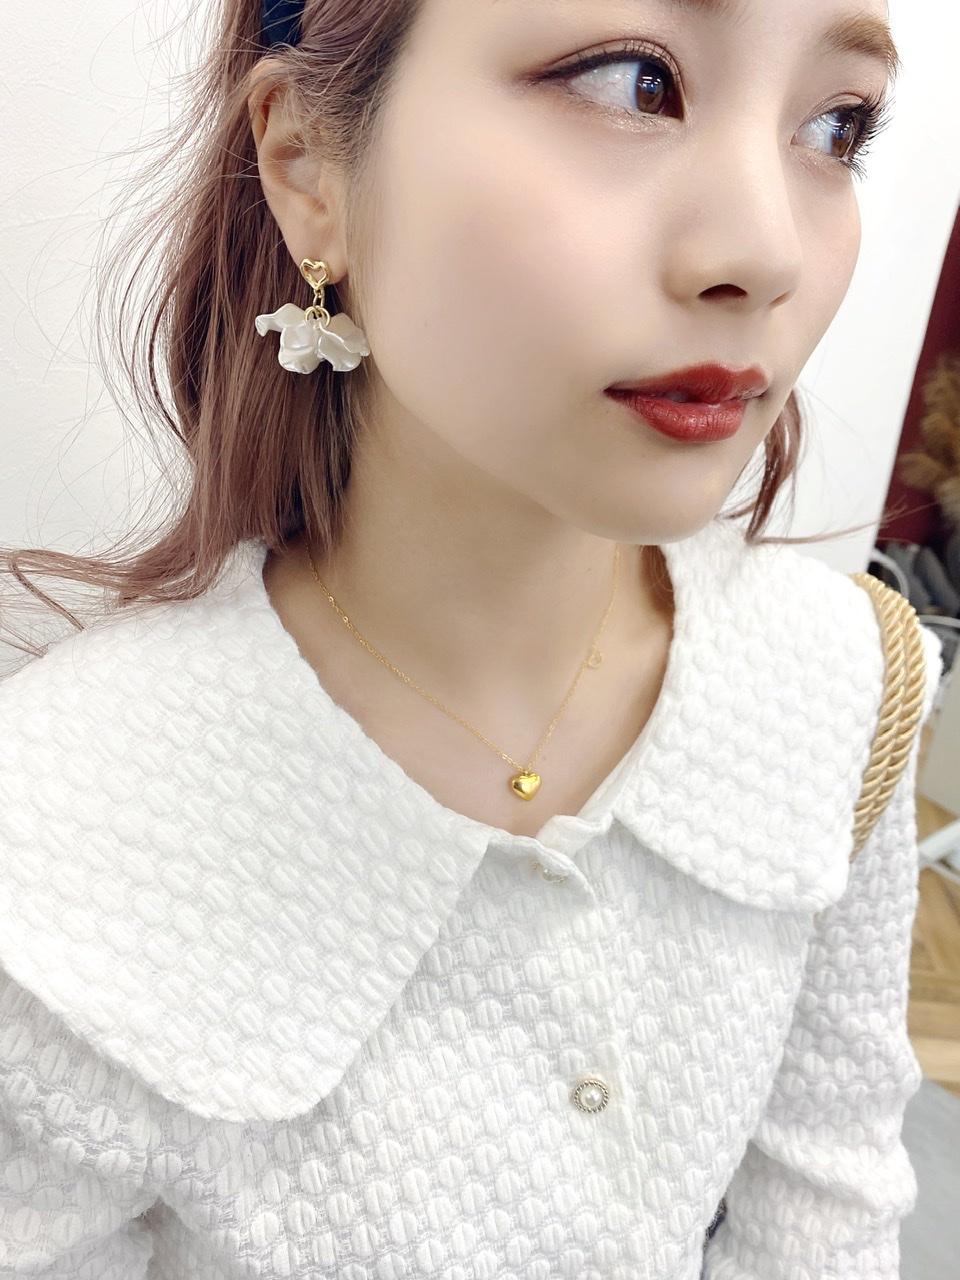 jelly pierce